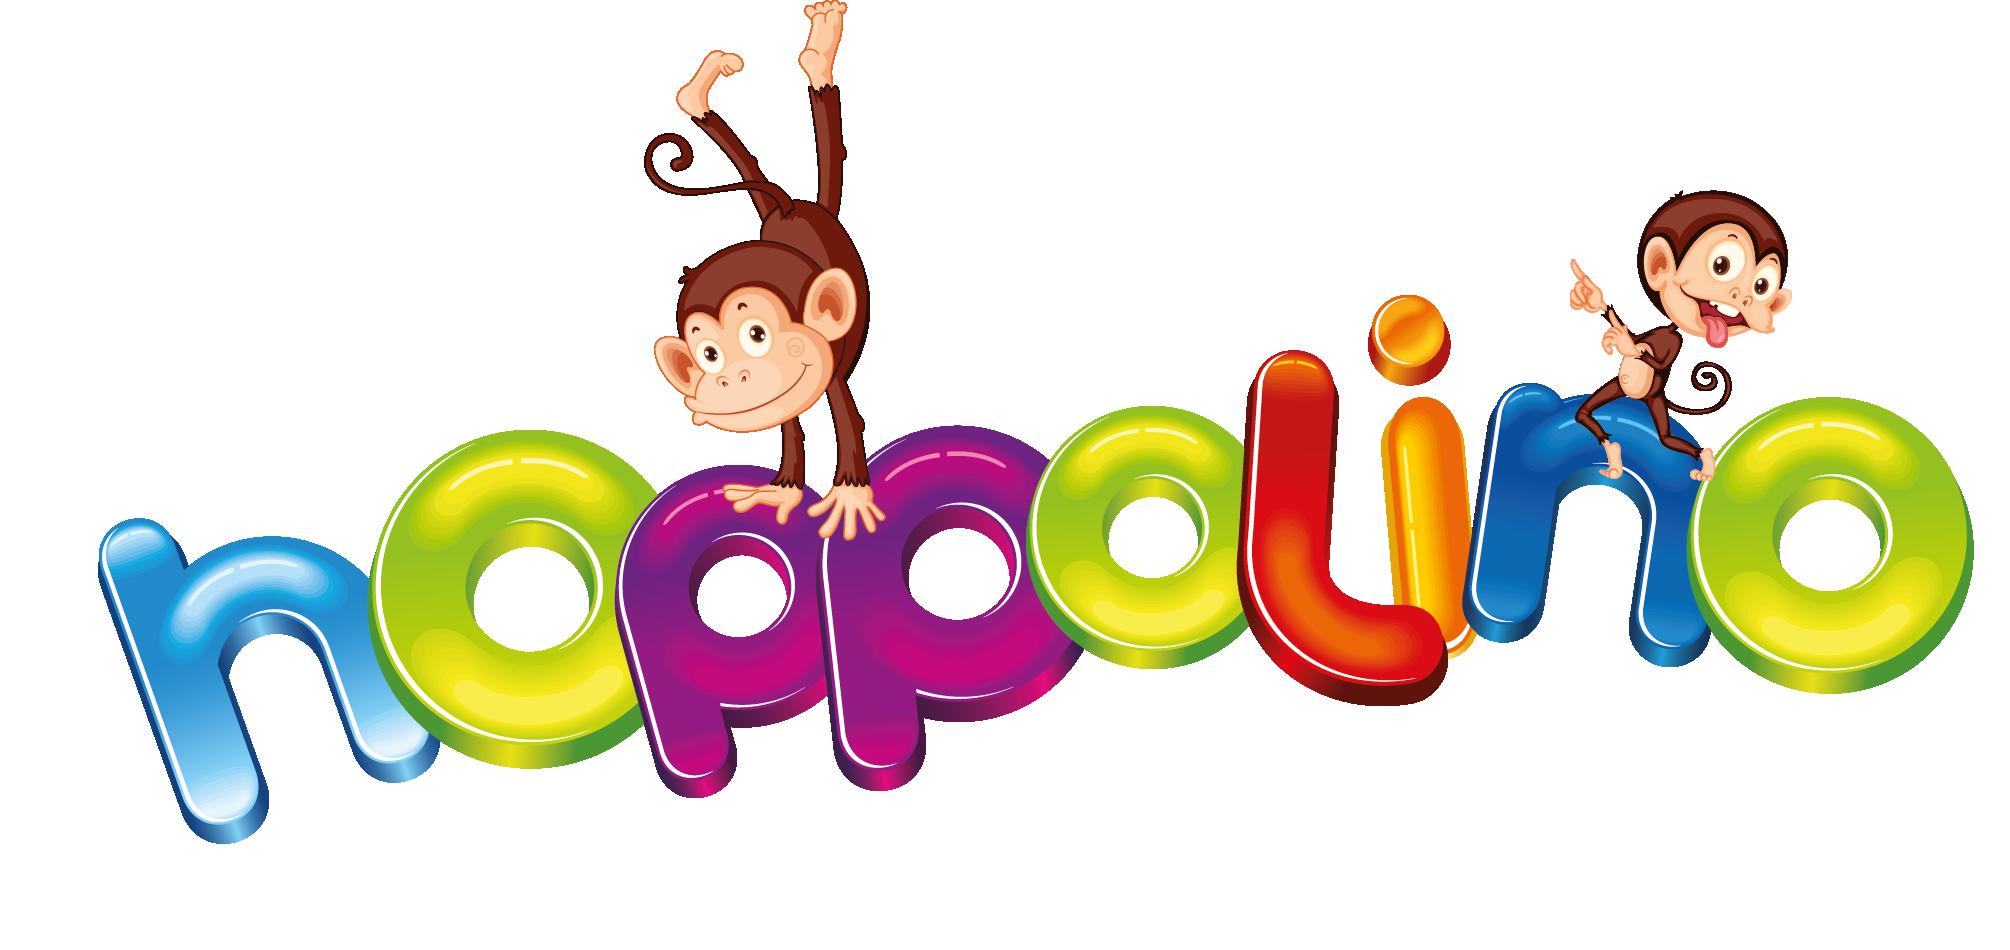 Hoppolino